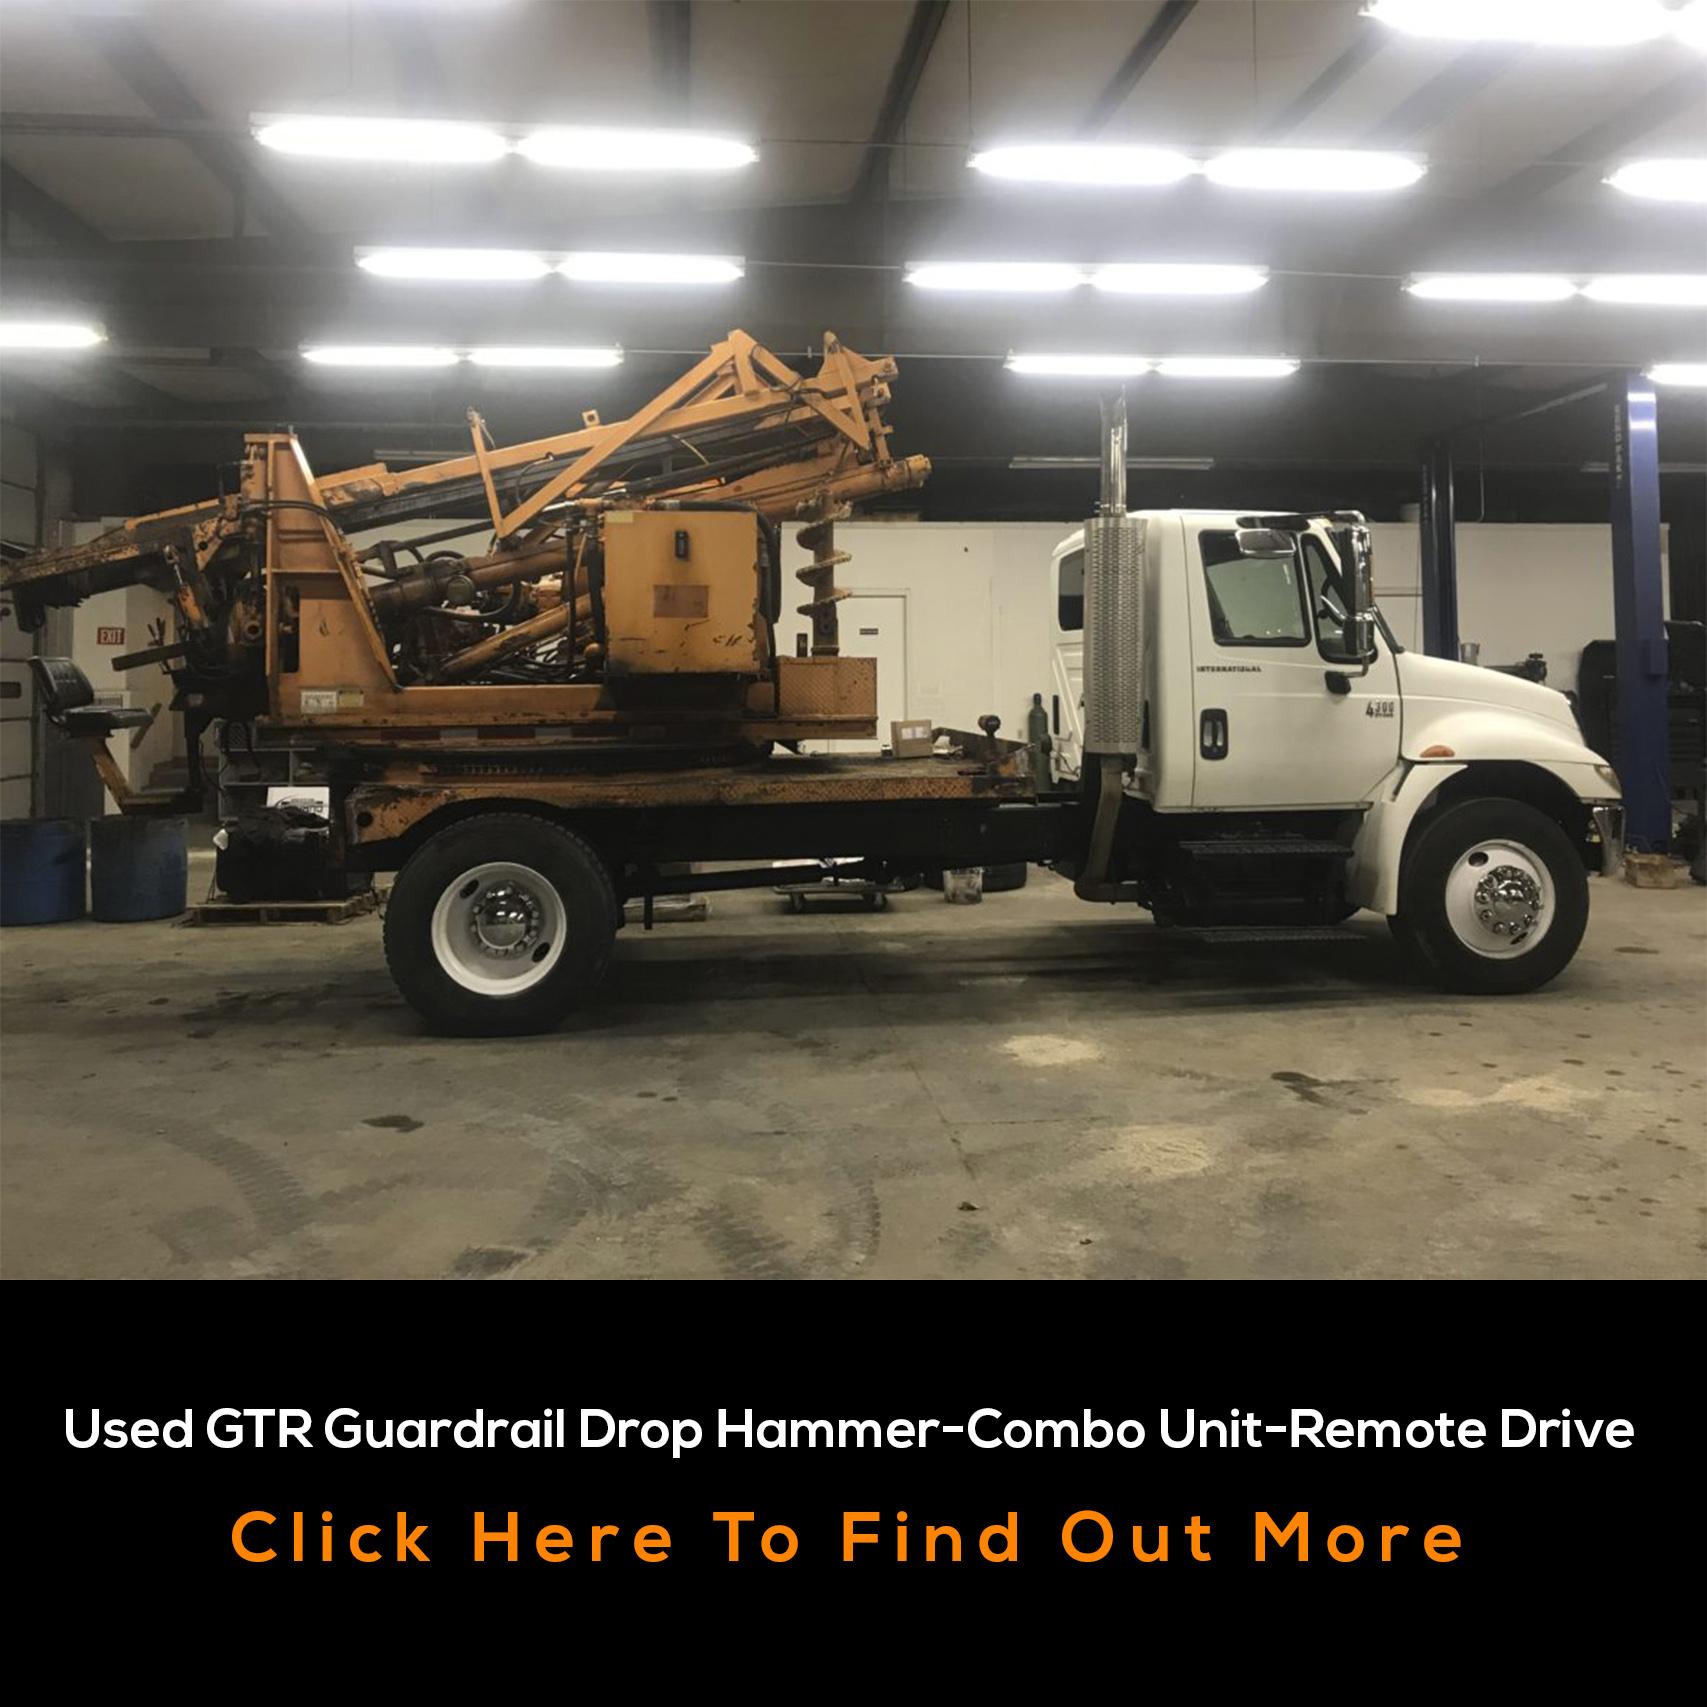 used grt guardrail drop hammer-combo unit-remote drive